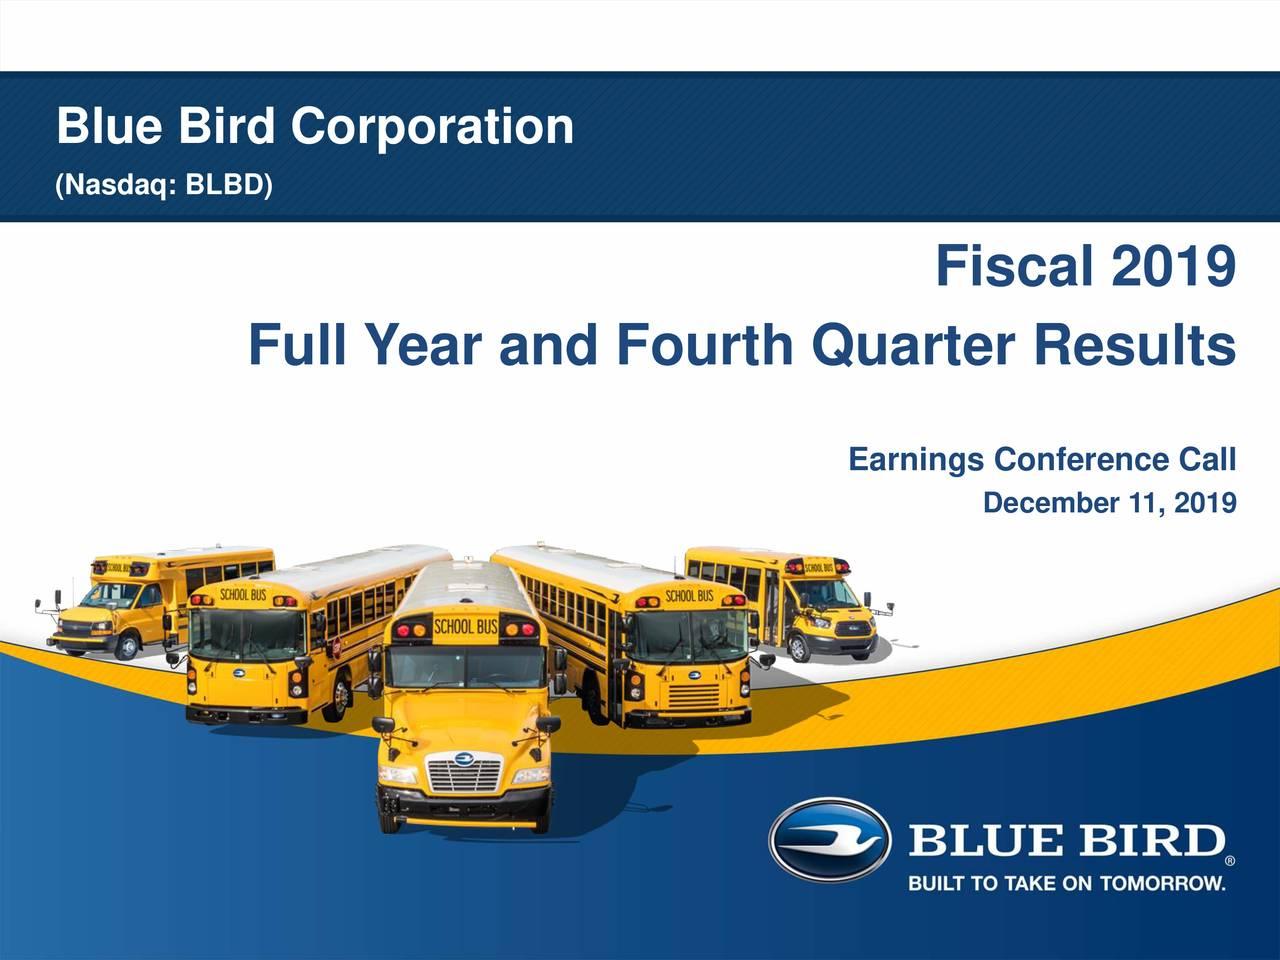 Blue Bird Corporation 2019 Q4 - Results - Earnings Call Presentation - Blue Bird Corporation (NASDAQ:BLBD) | Seeking Alpha